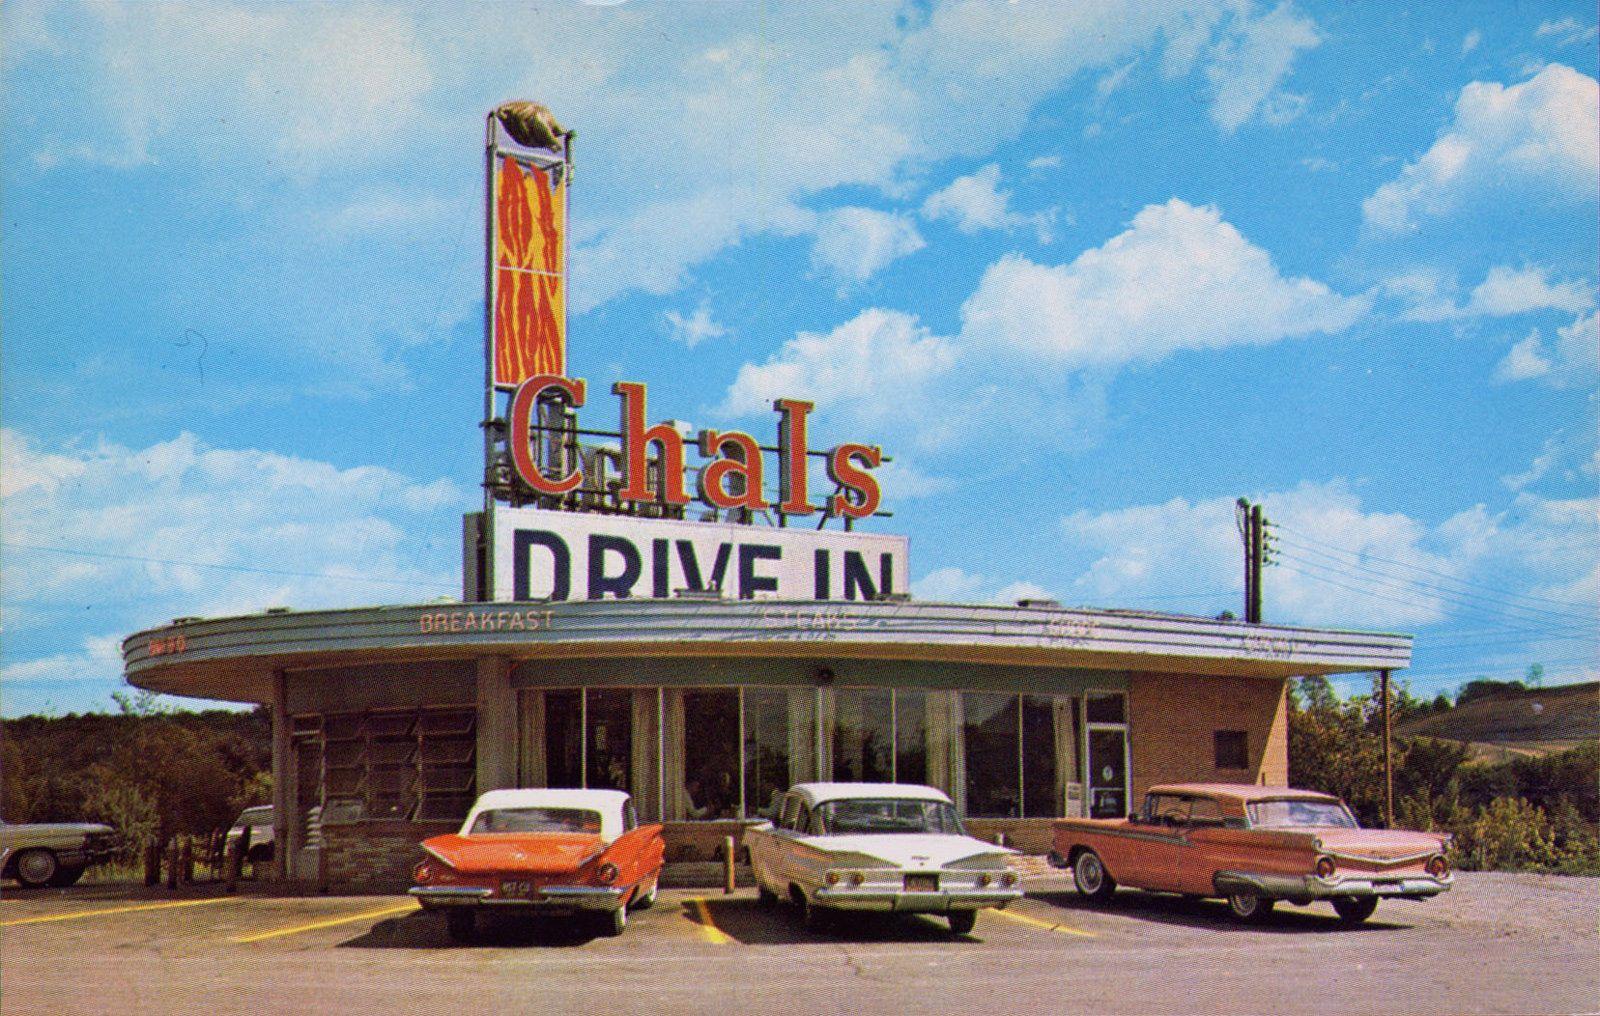 Https Flic Kr P Wef2bs Chal S Drive In Restaurant Cambridge Ohio